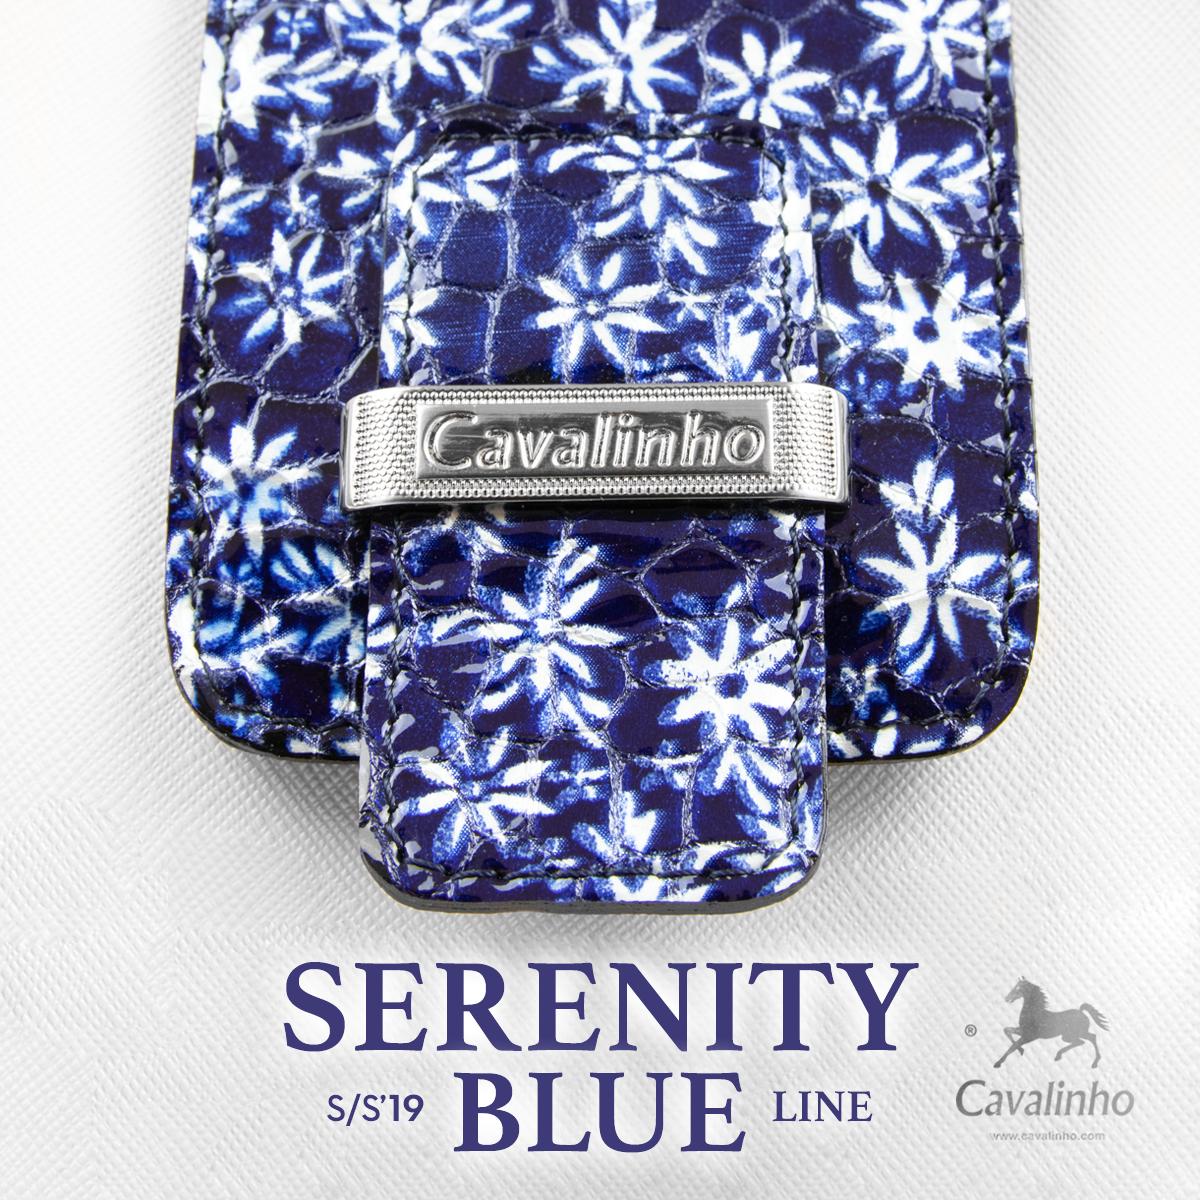 serenity_blue_post_01